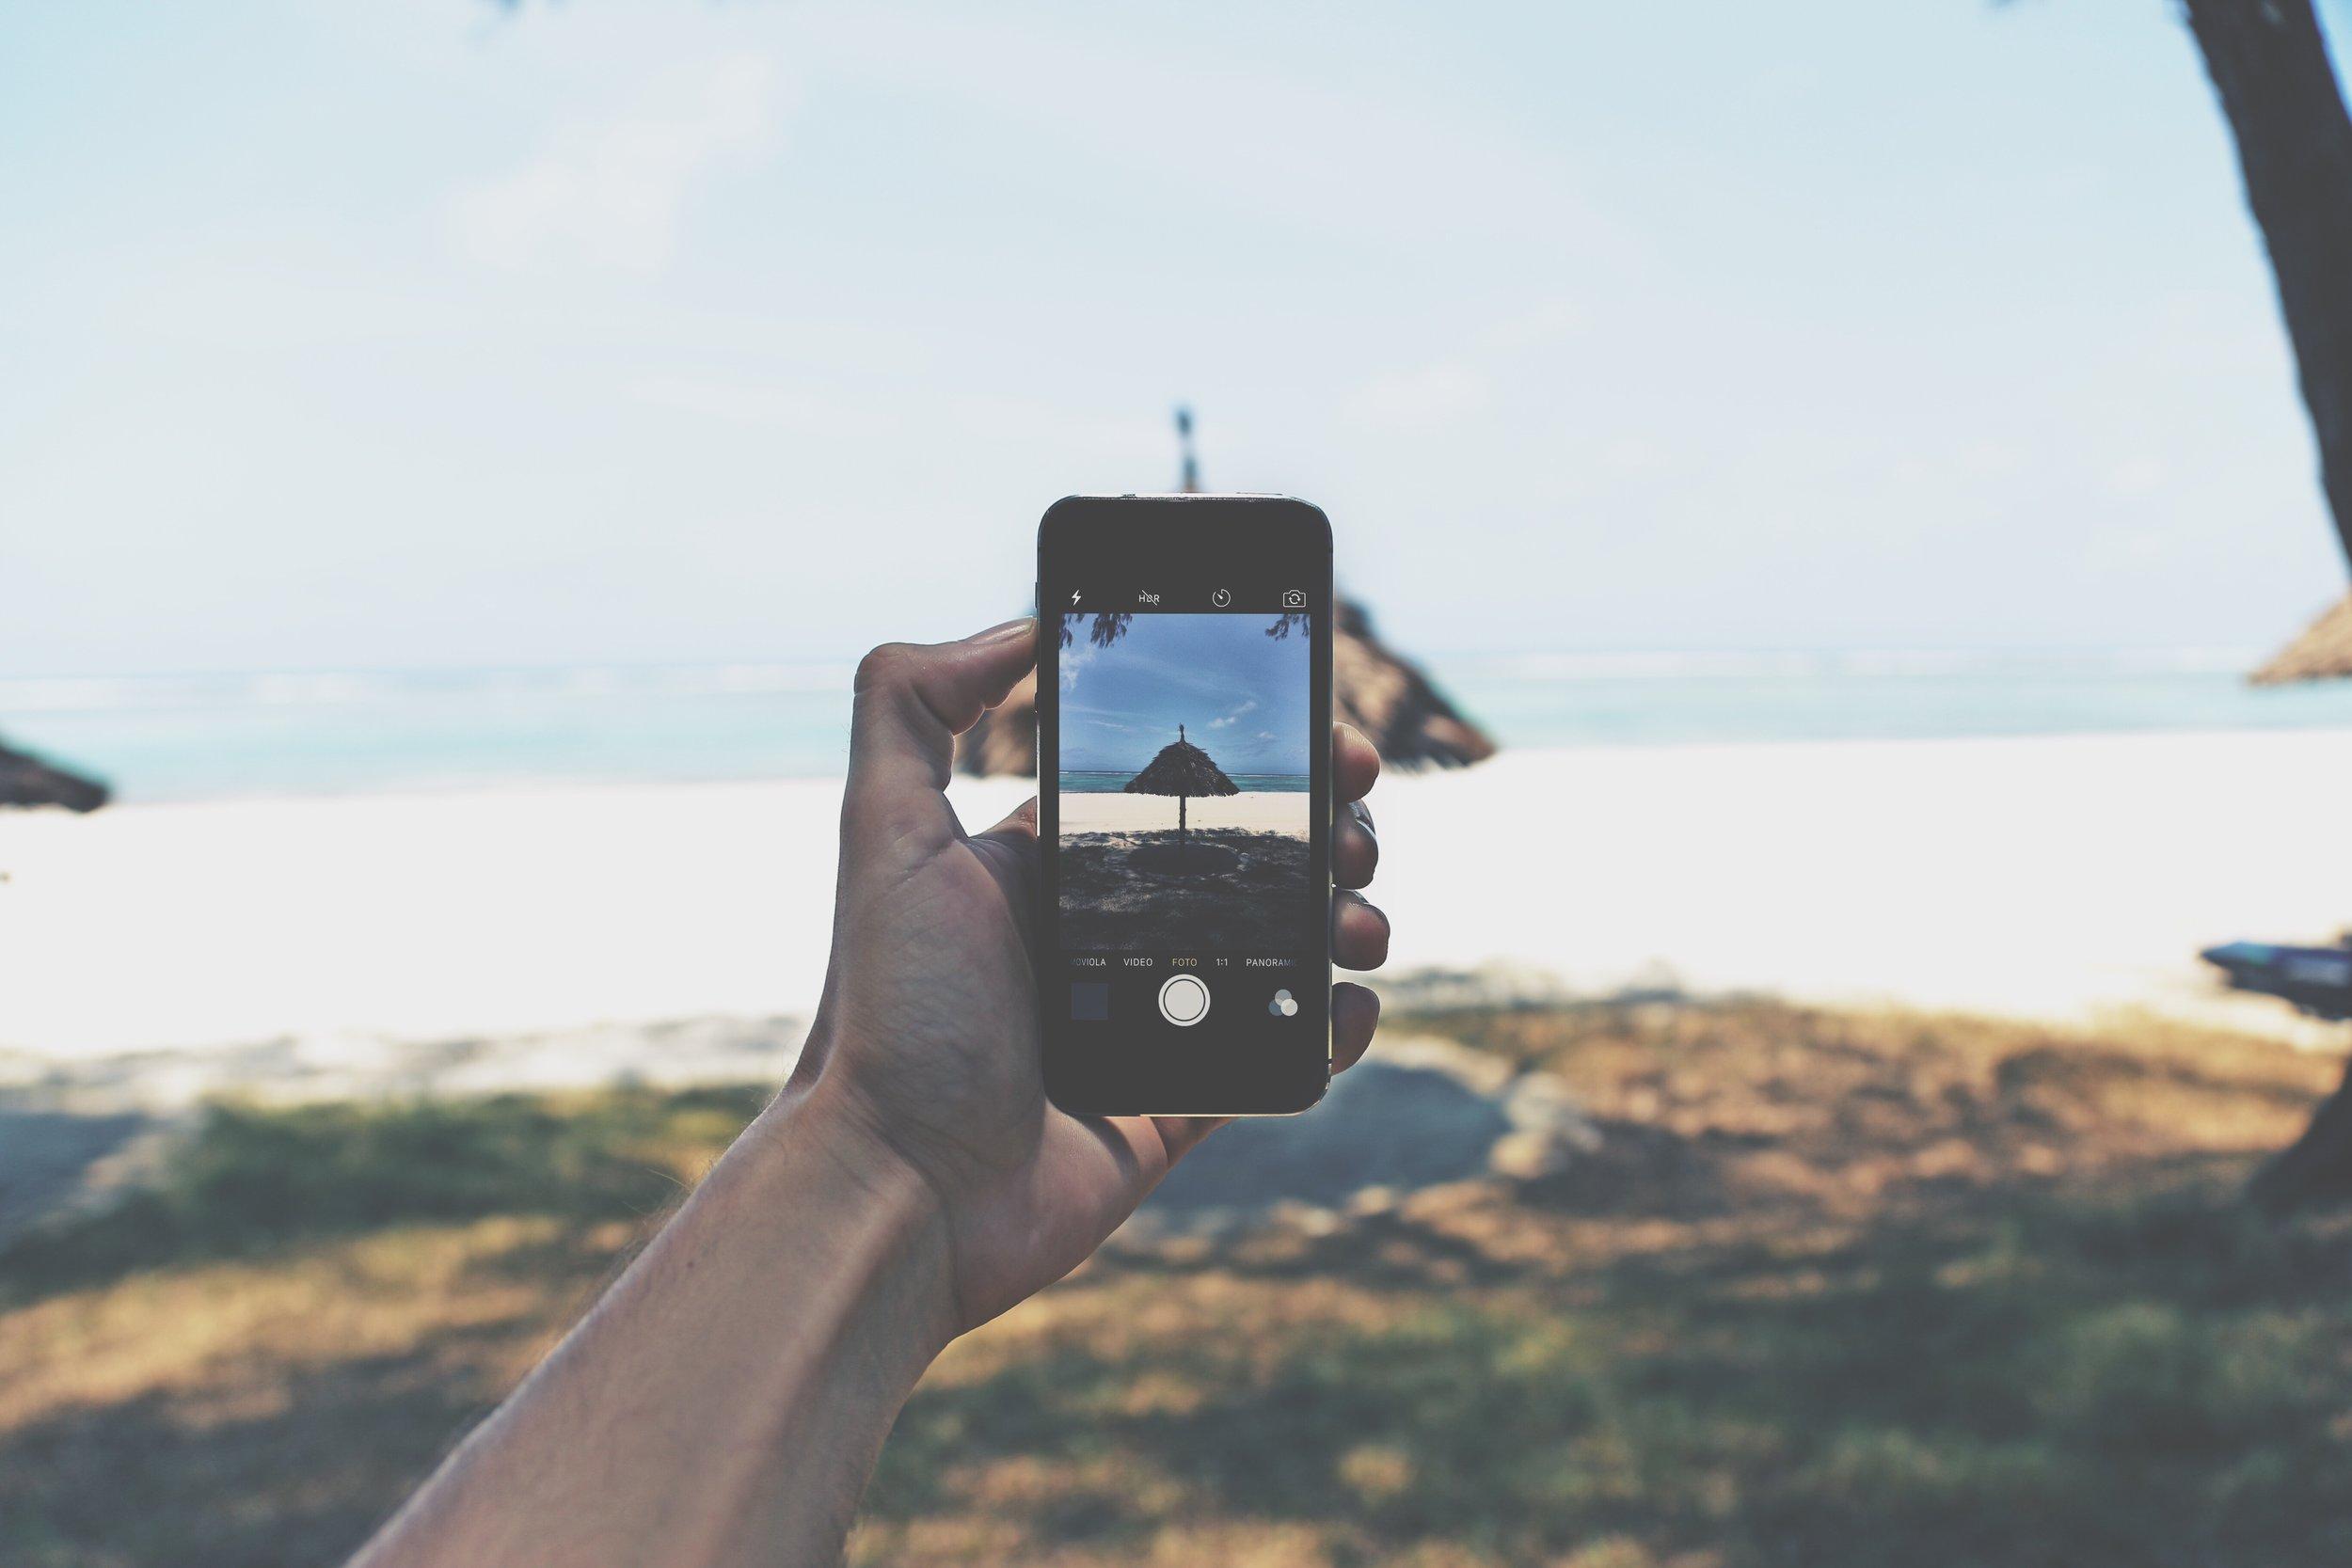 beach-cellphone-day-861104.jpg